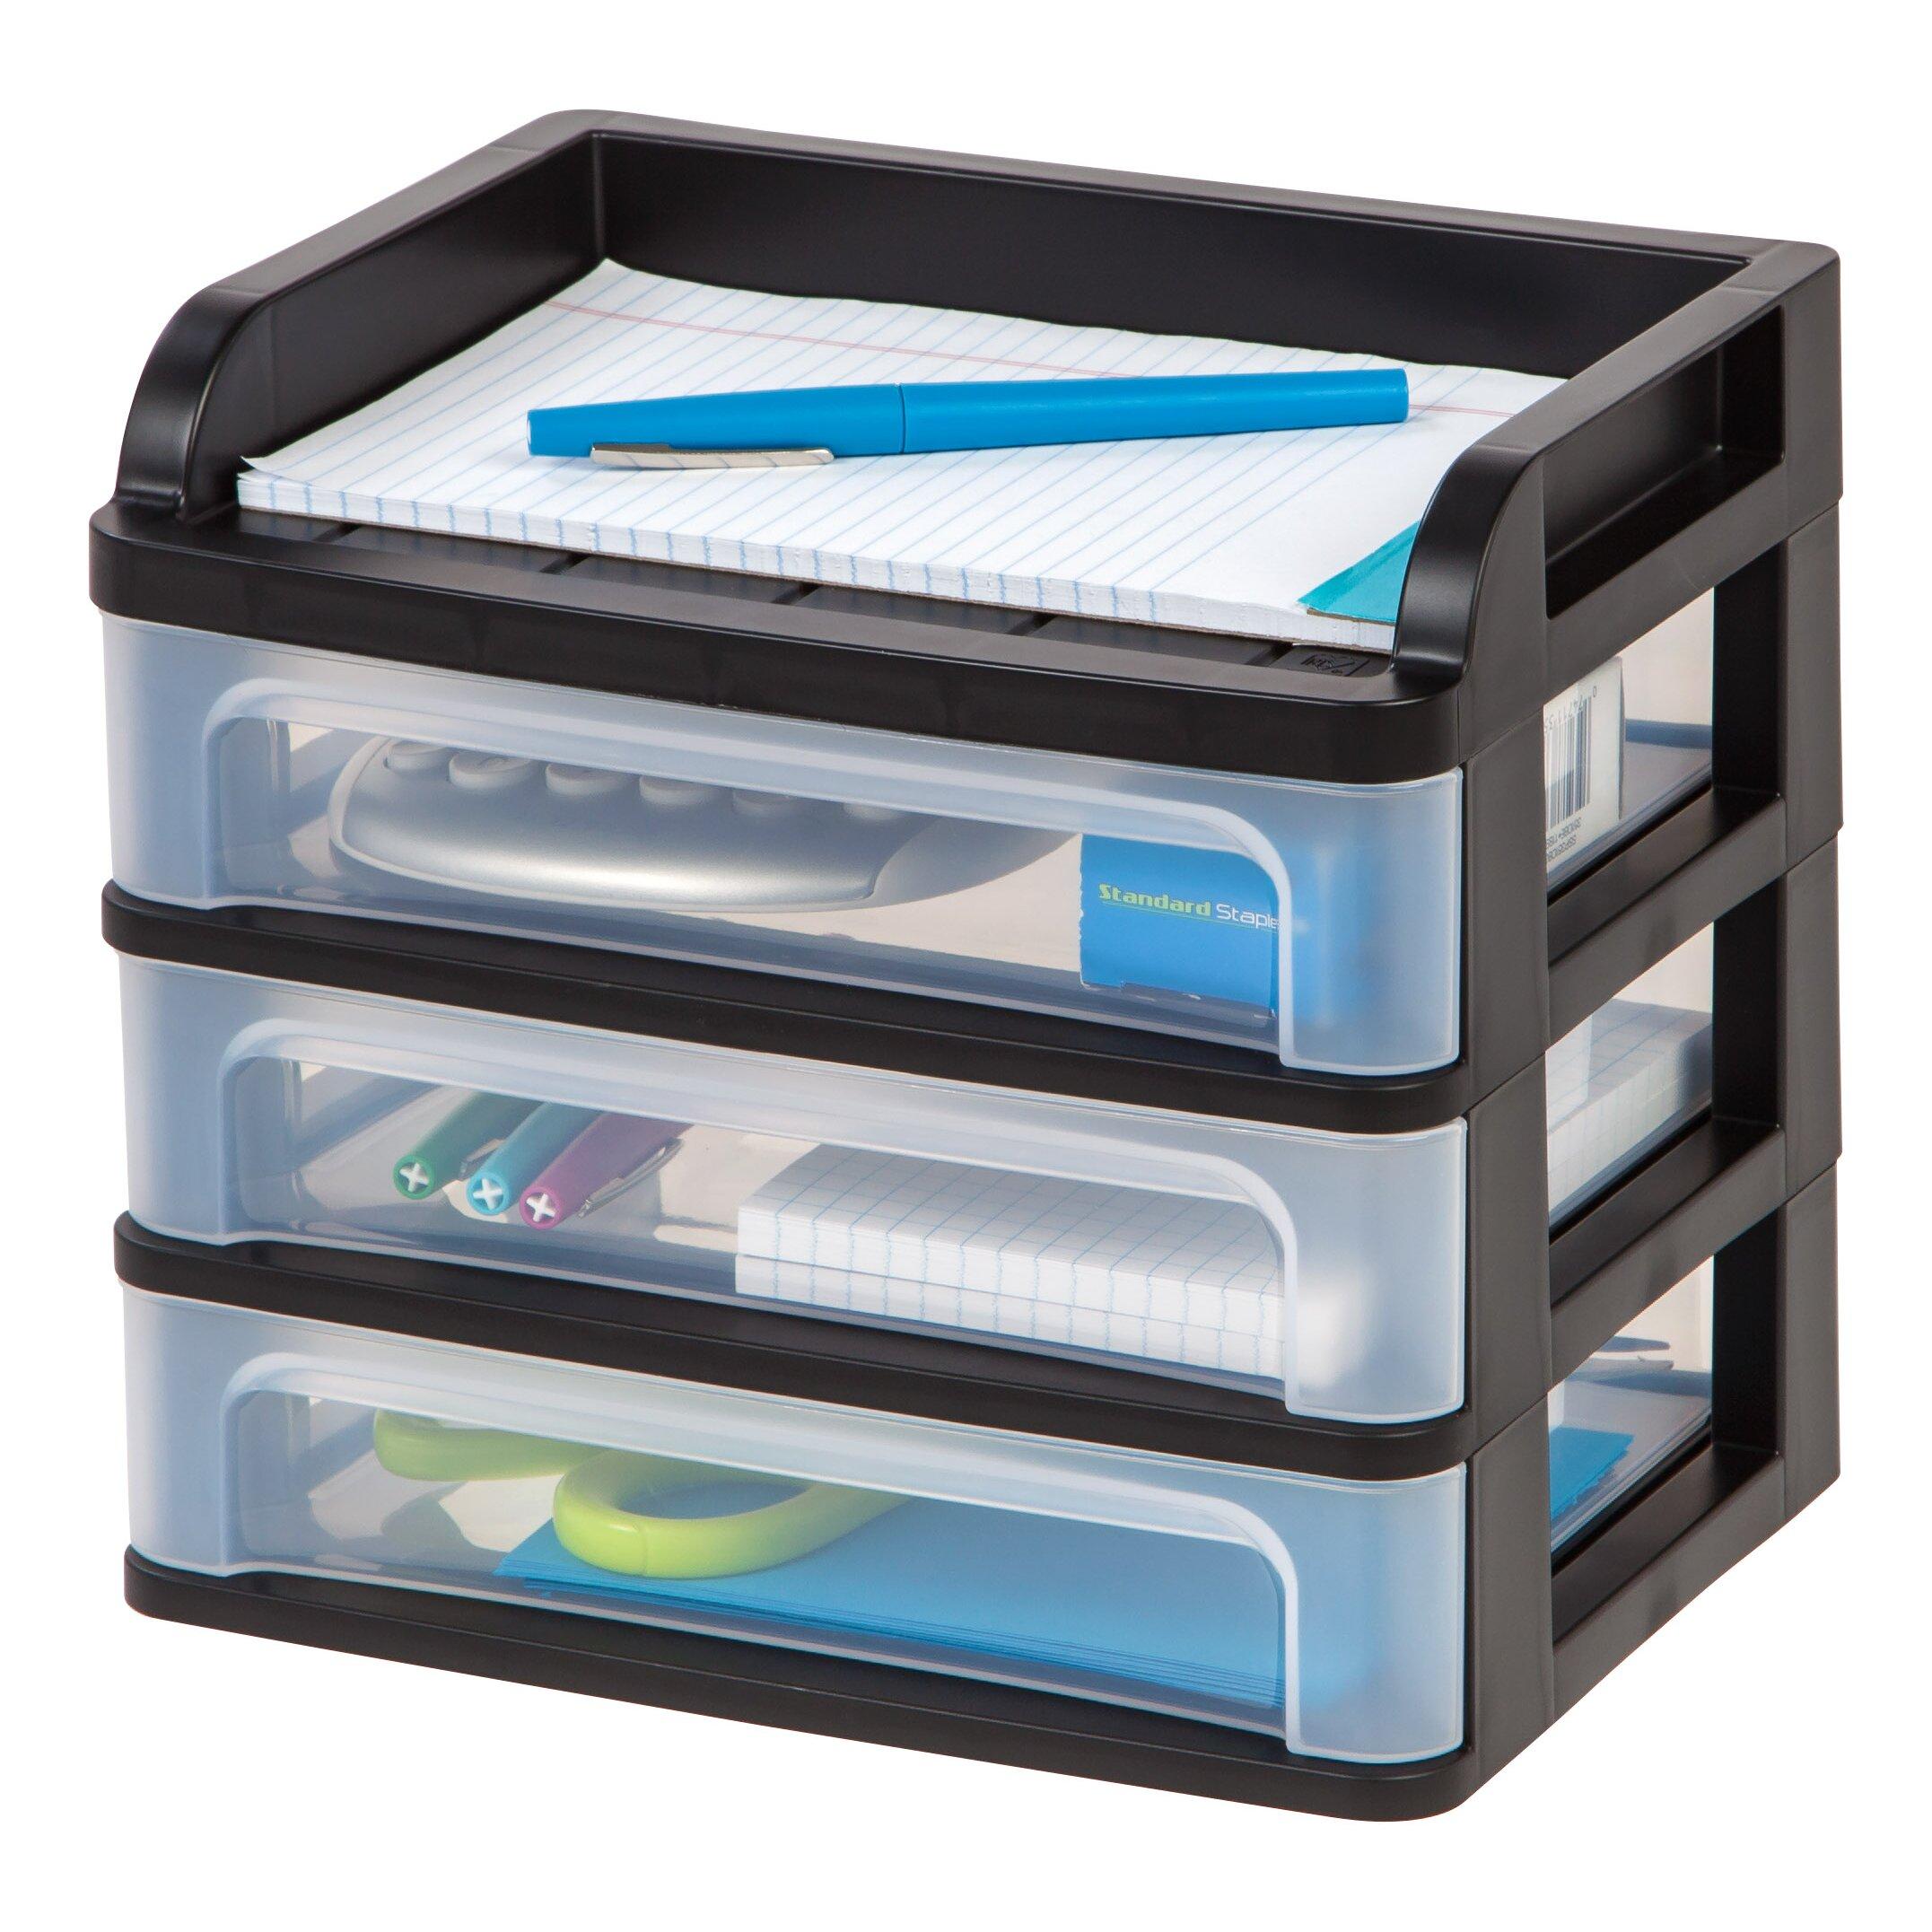 iris 3 drawer small desktop organizer reviews wayfair. Black Bedroom Furniture Sets. Home Design Ideas